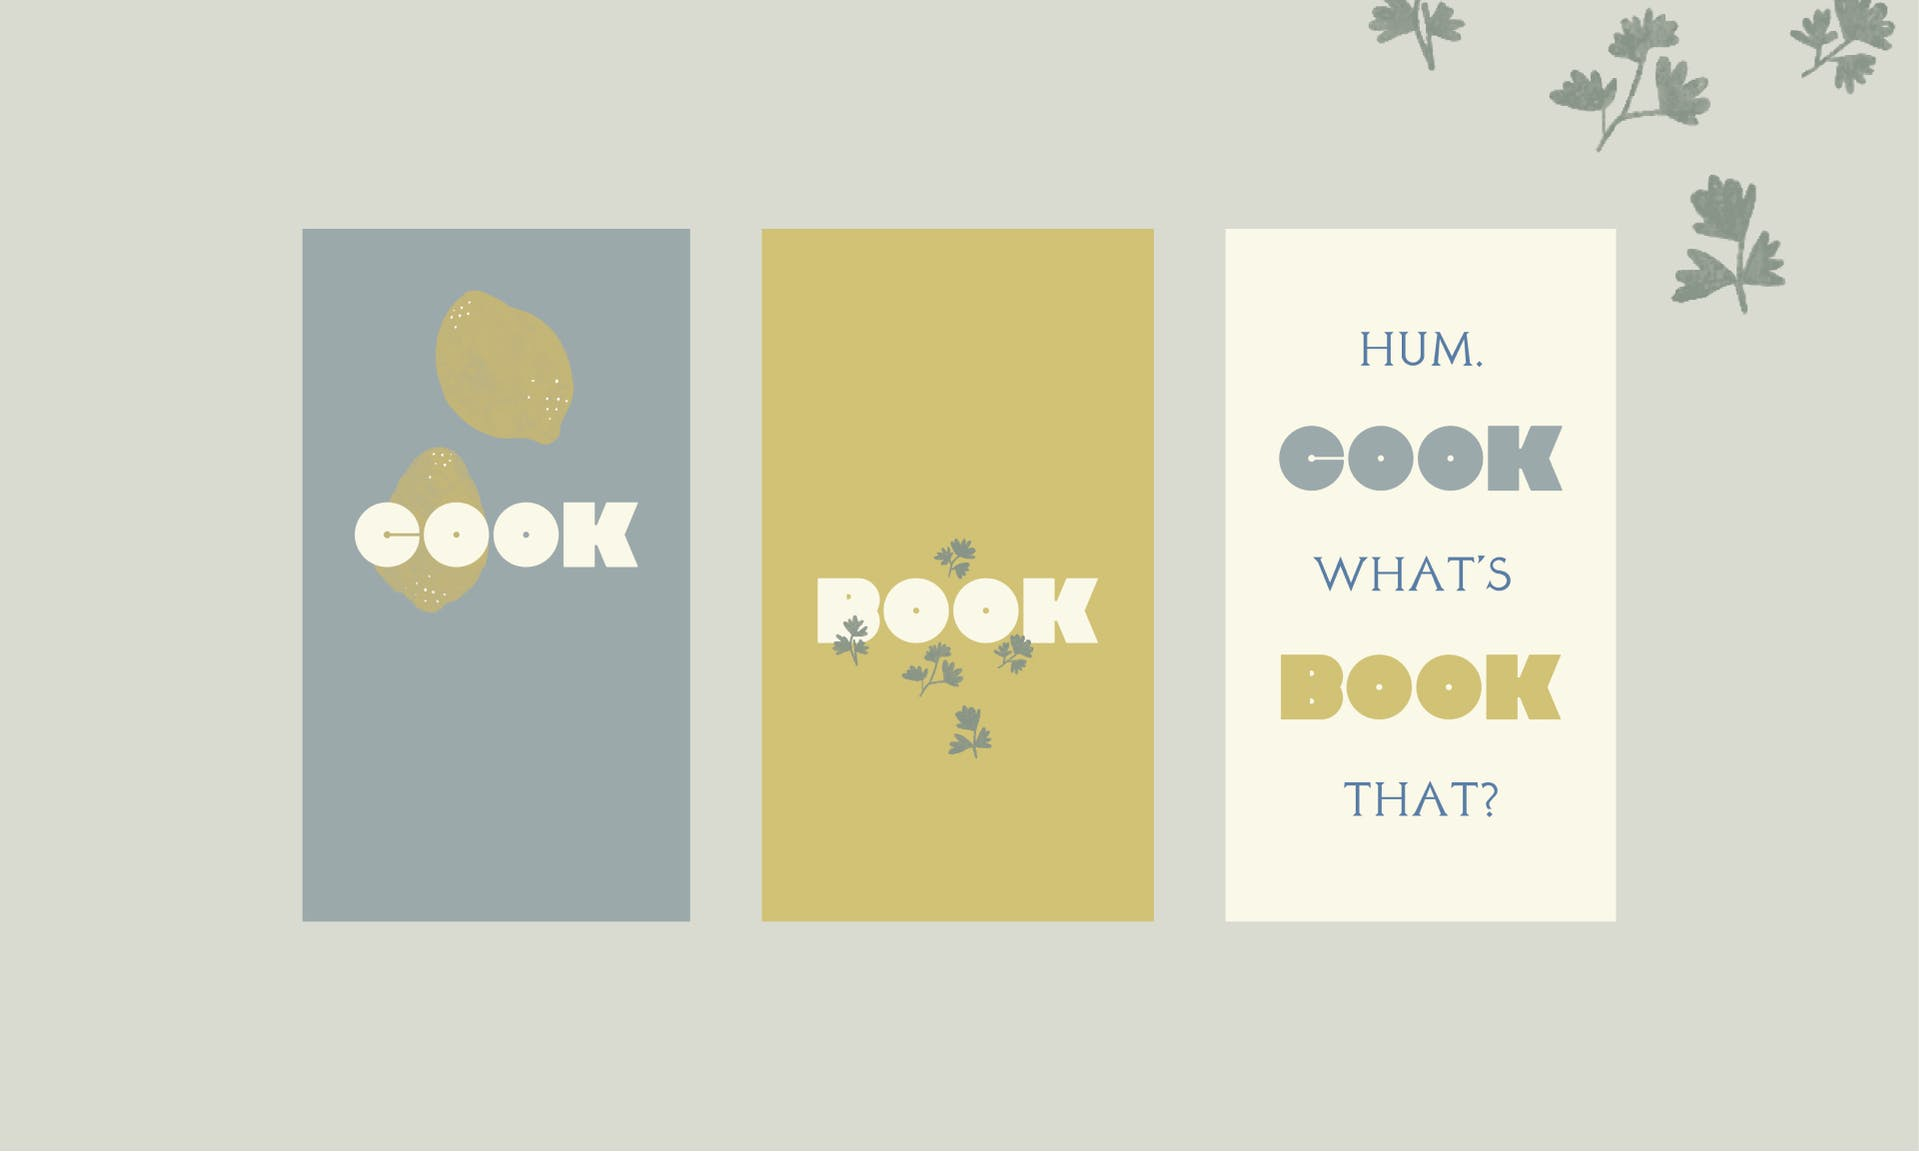 Cookbook case study image